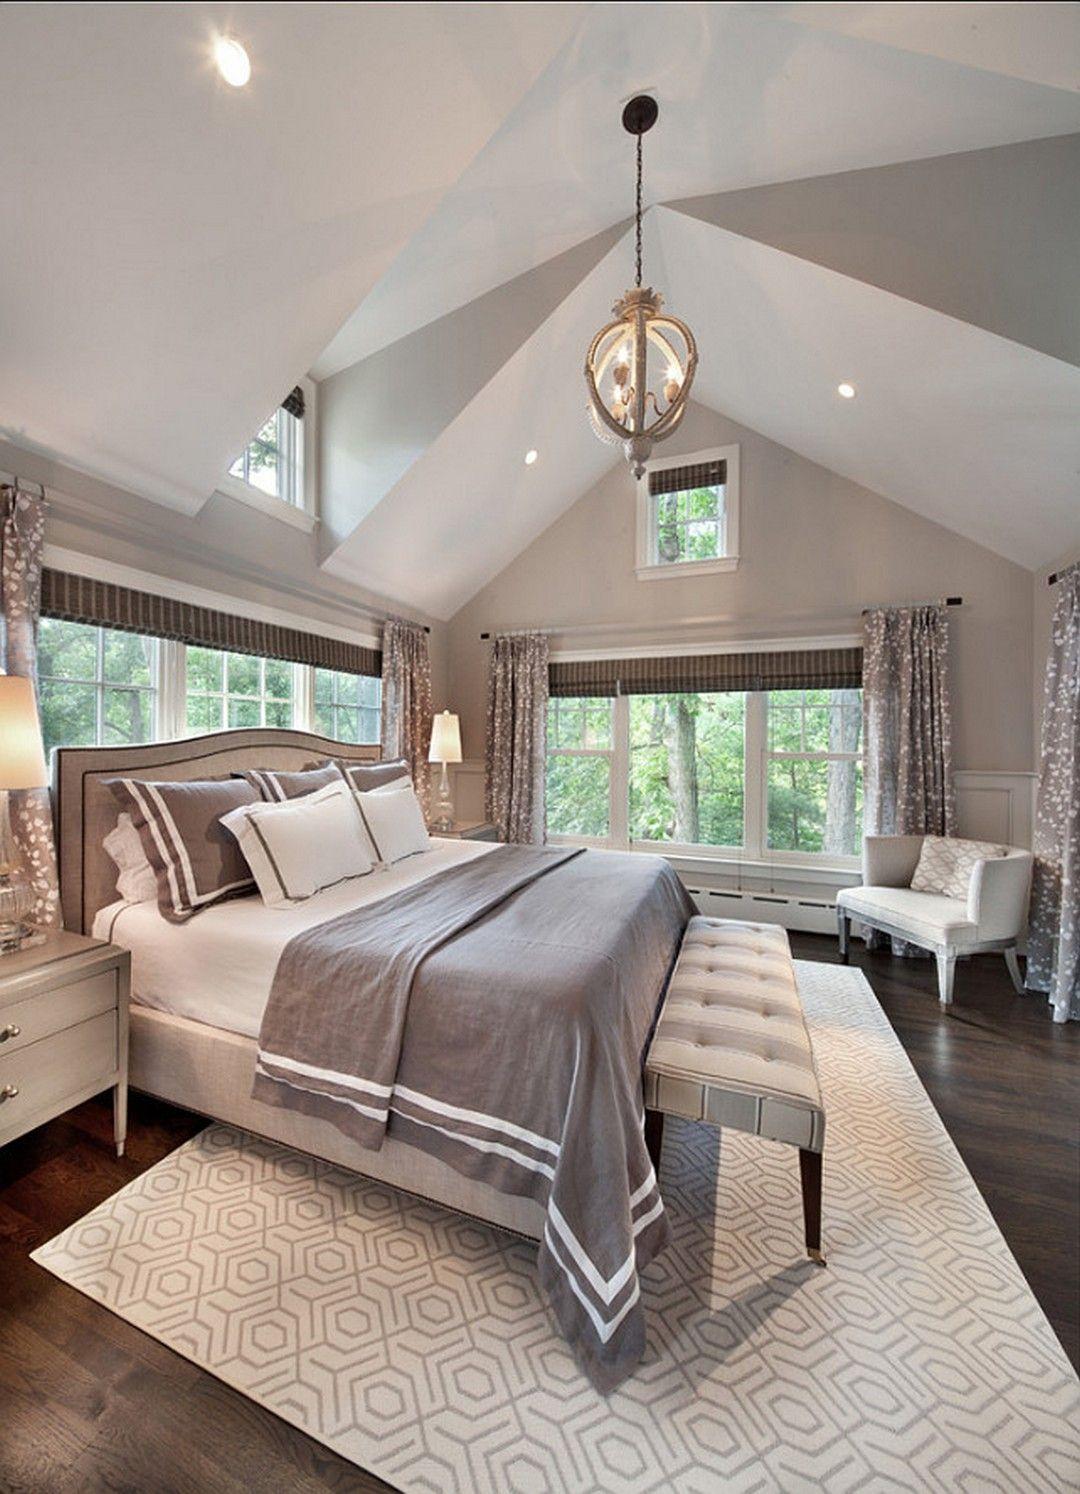 Cool unbelievably inspiring master bedroom design ideas